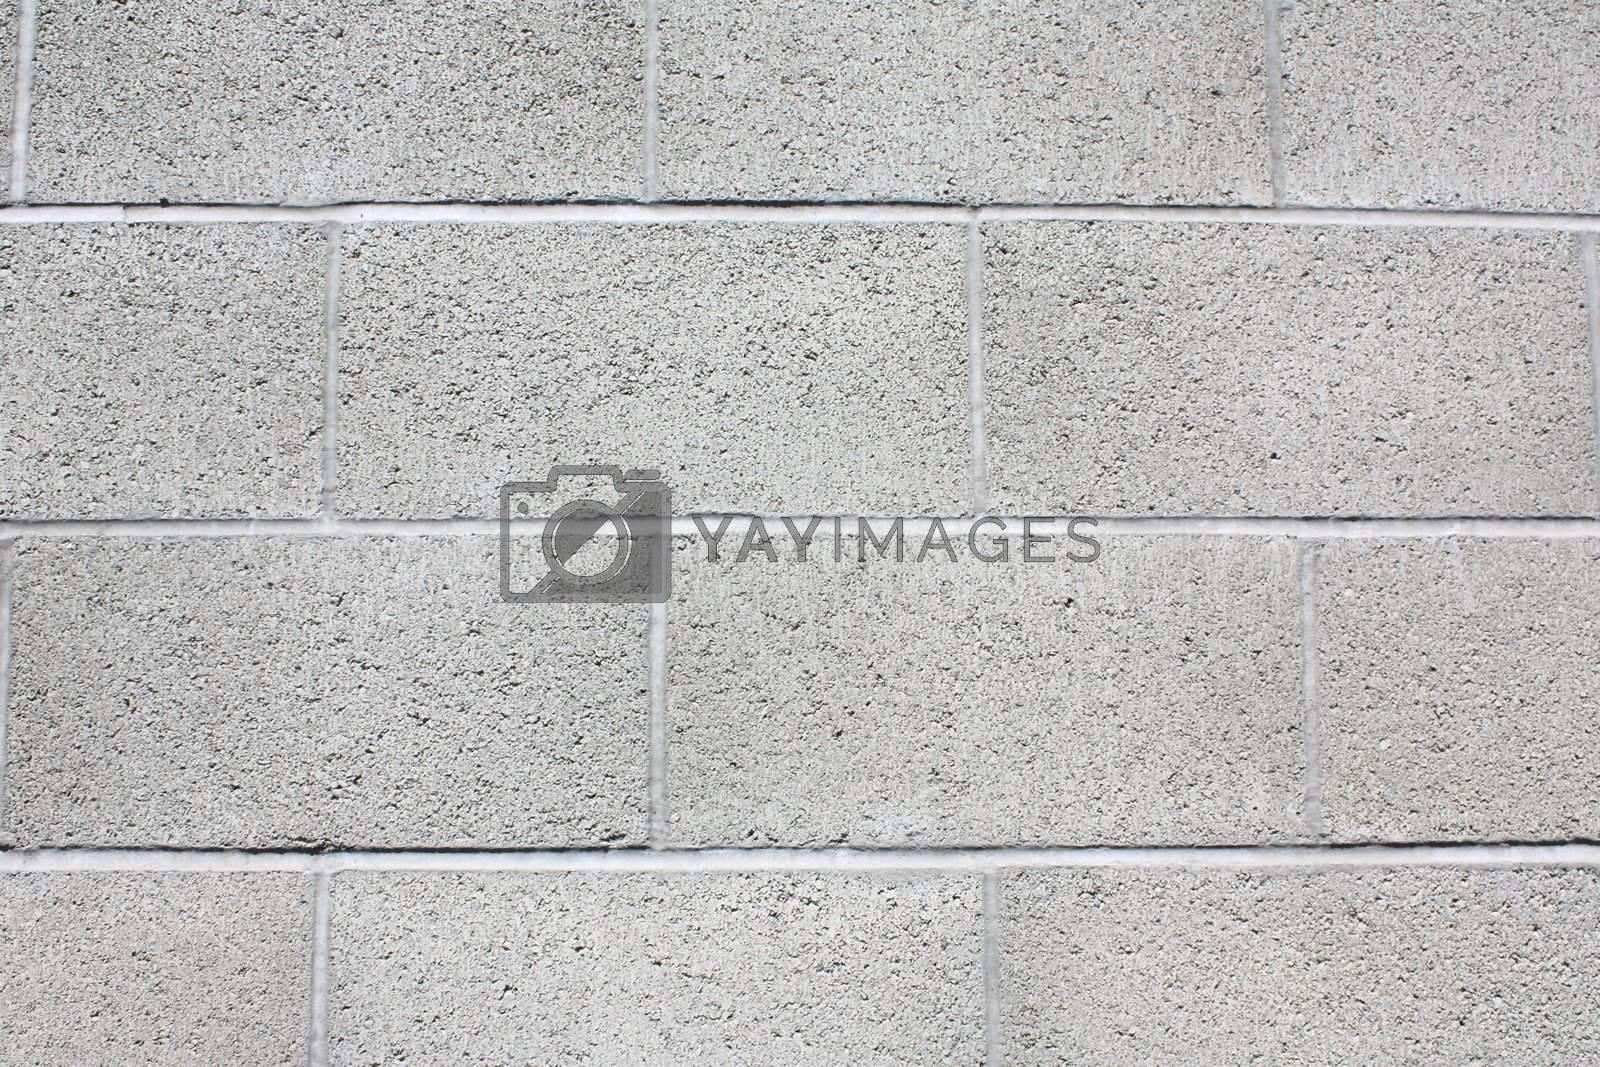 Royalty free image of Close-up of gray brick, cinderblock wall. by gregorydean